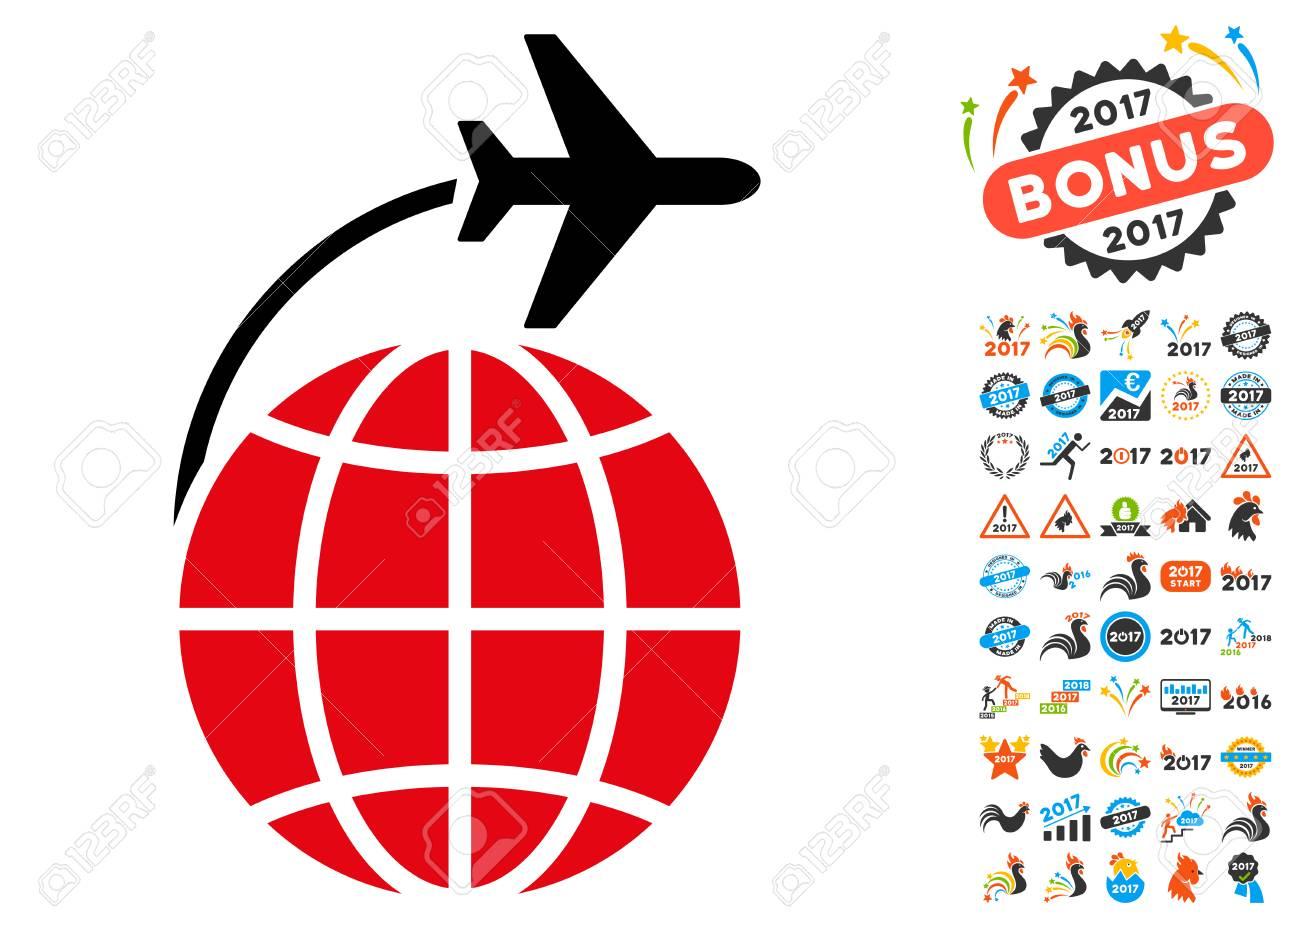 International Flight icon with 2017 year bonus glyph pictographs.